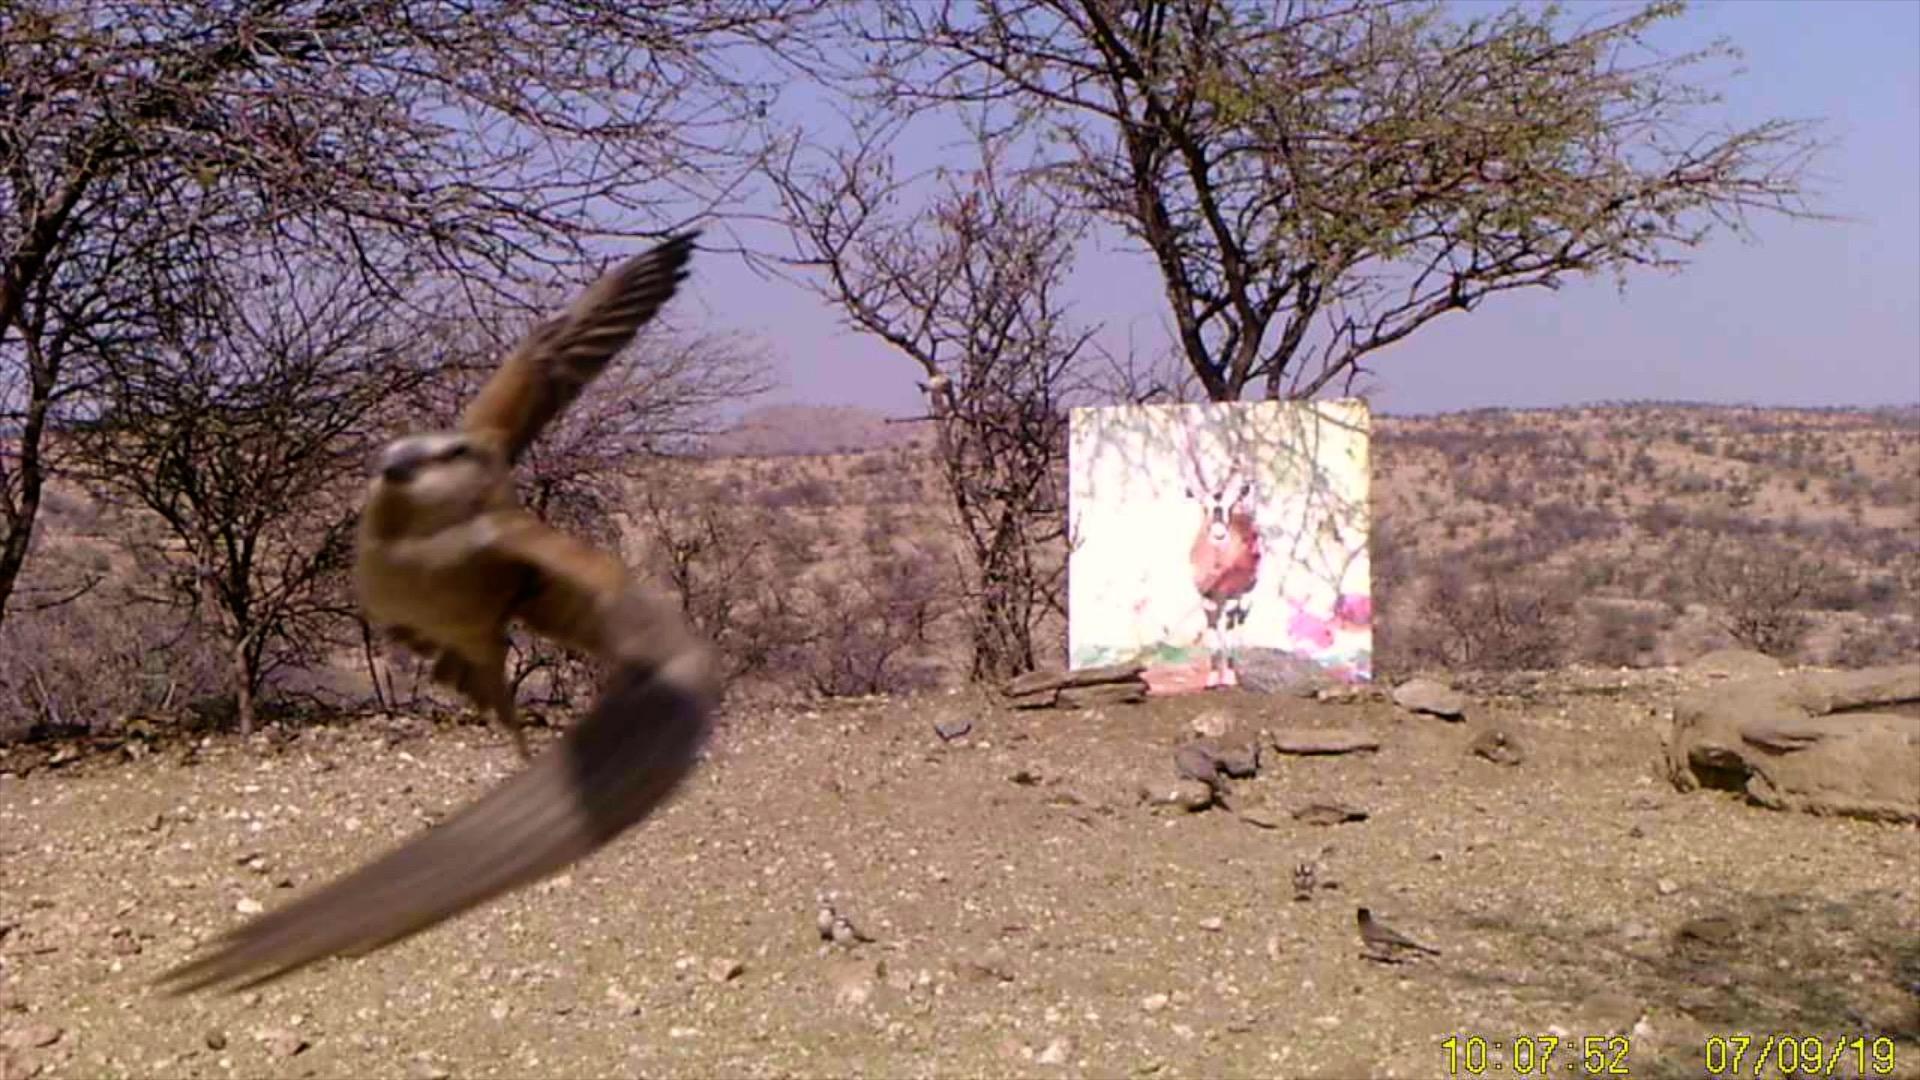 Filmstill SUPERWILDVISION Namibia 2019, Afrika, Kunstprojekt von Irene Mueller, Vogel Gemaelde Antilope